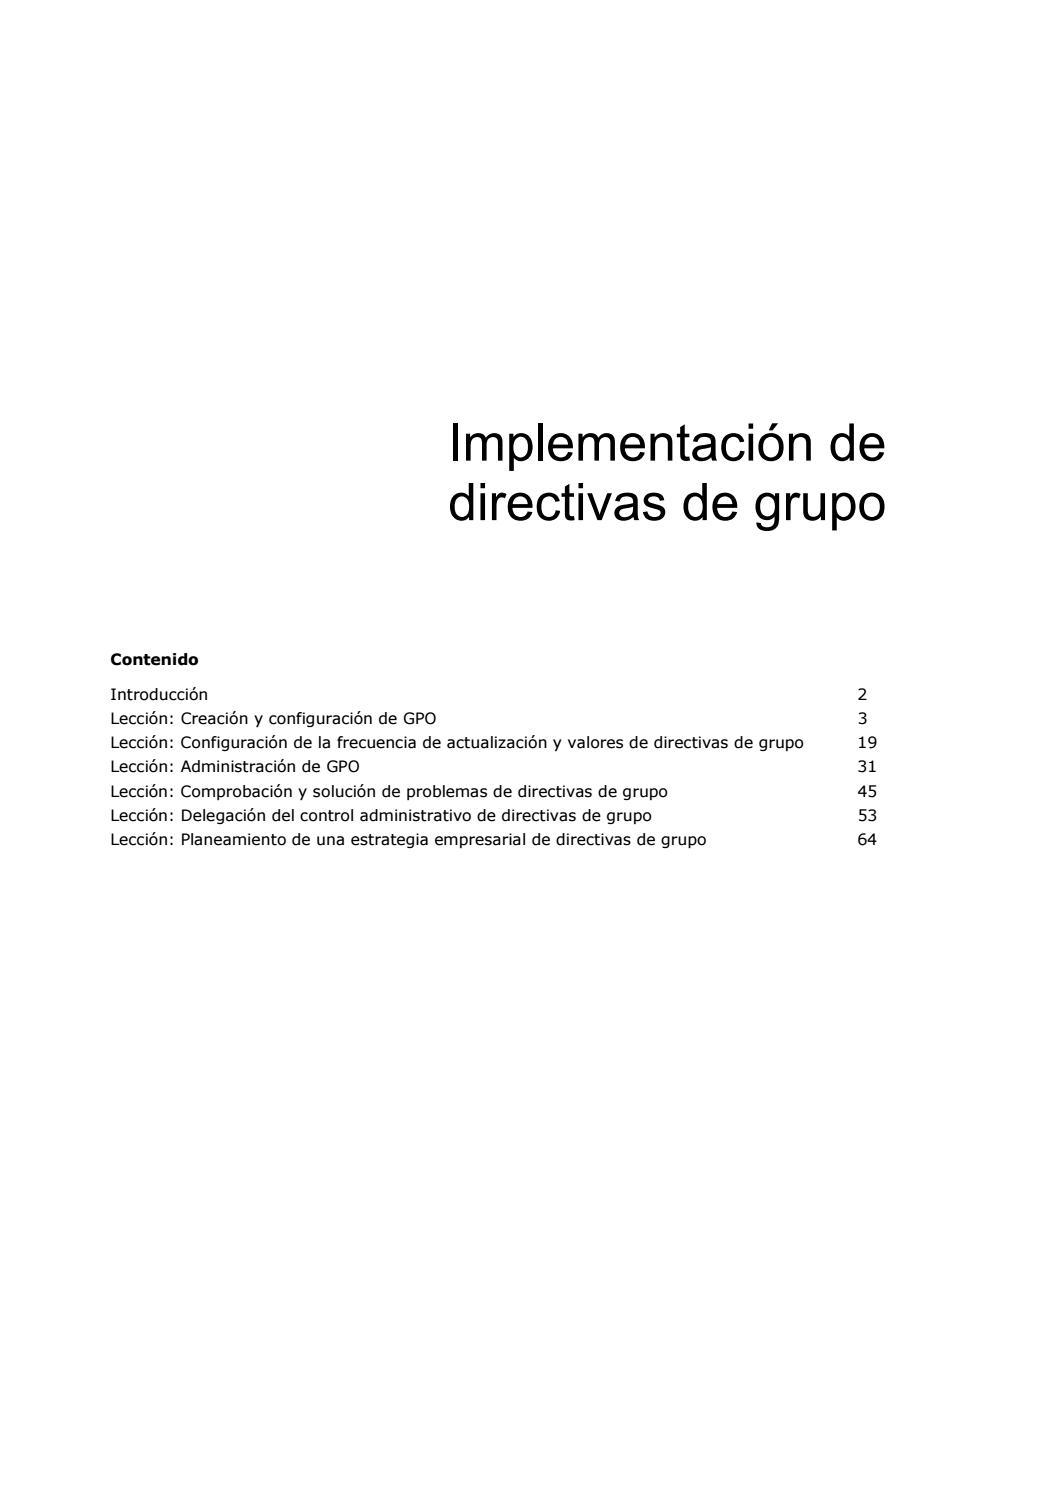 17 implementacion de directivas de grupo by Juan Zúñiga Flores - issuu